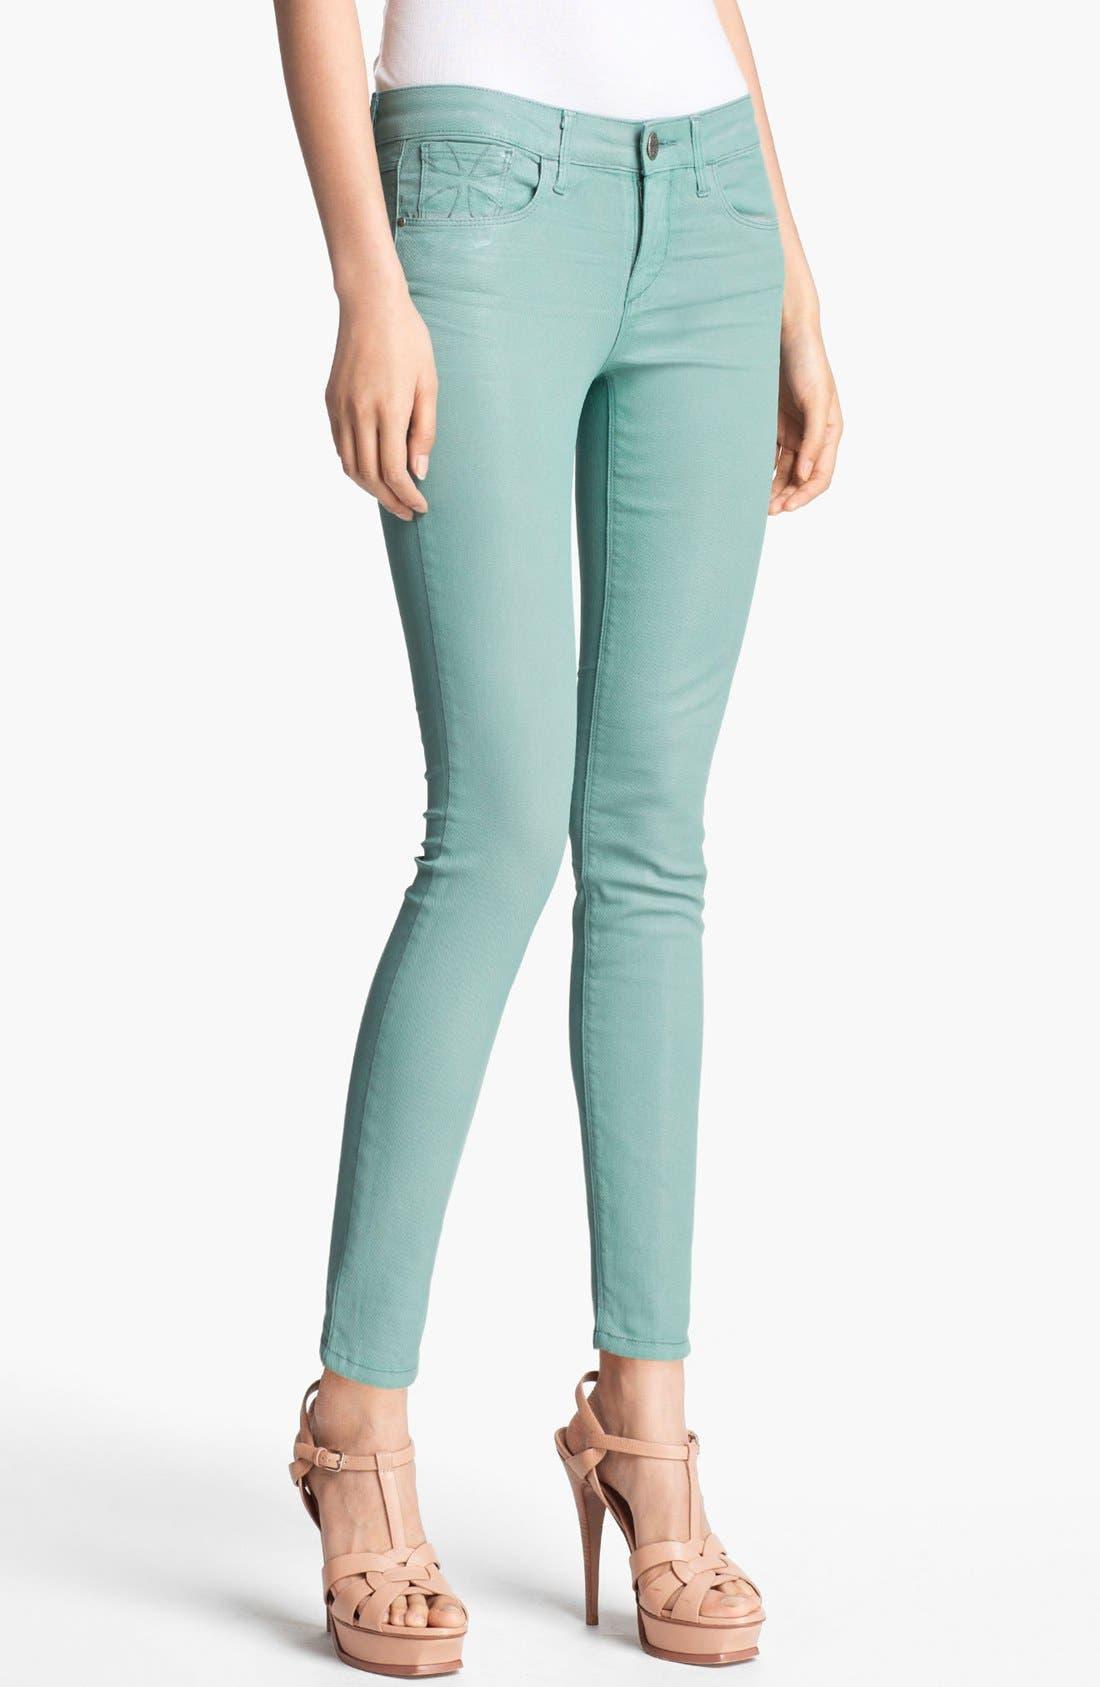 Alternate Image 1 Selected - Habitual 'Angelina' Coated Cigarette Leg Stretch Jeans